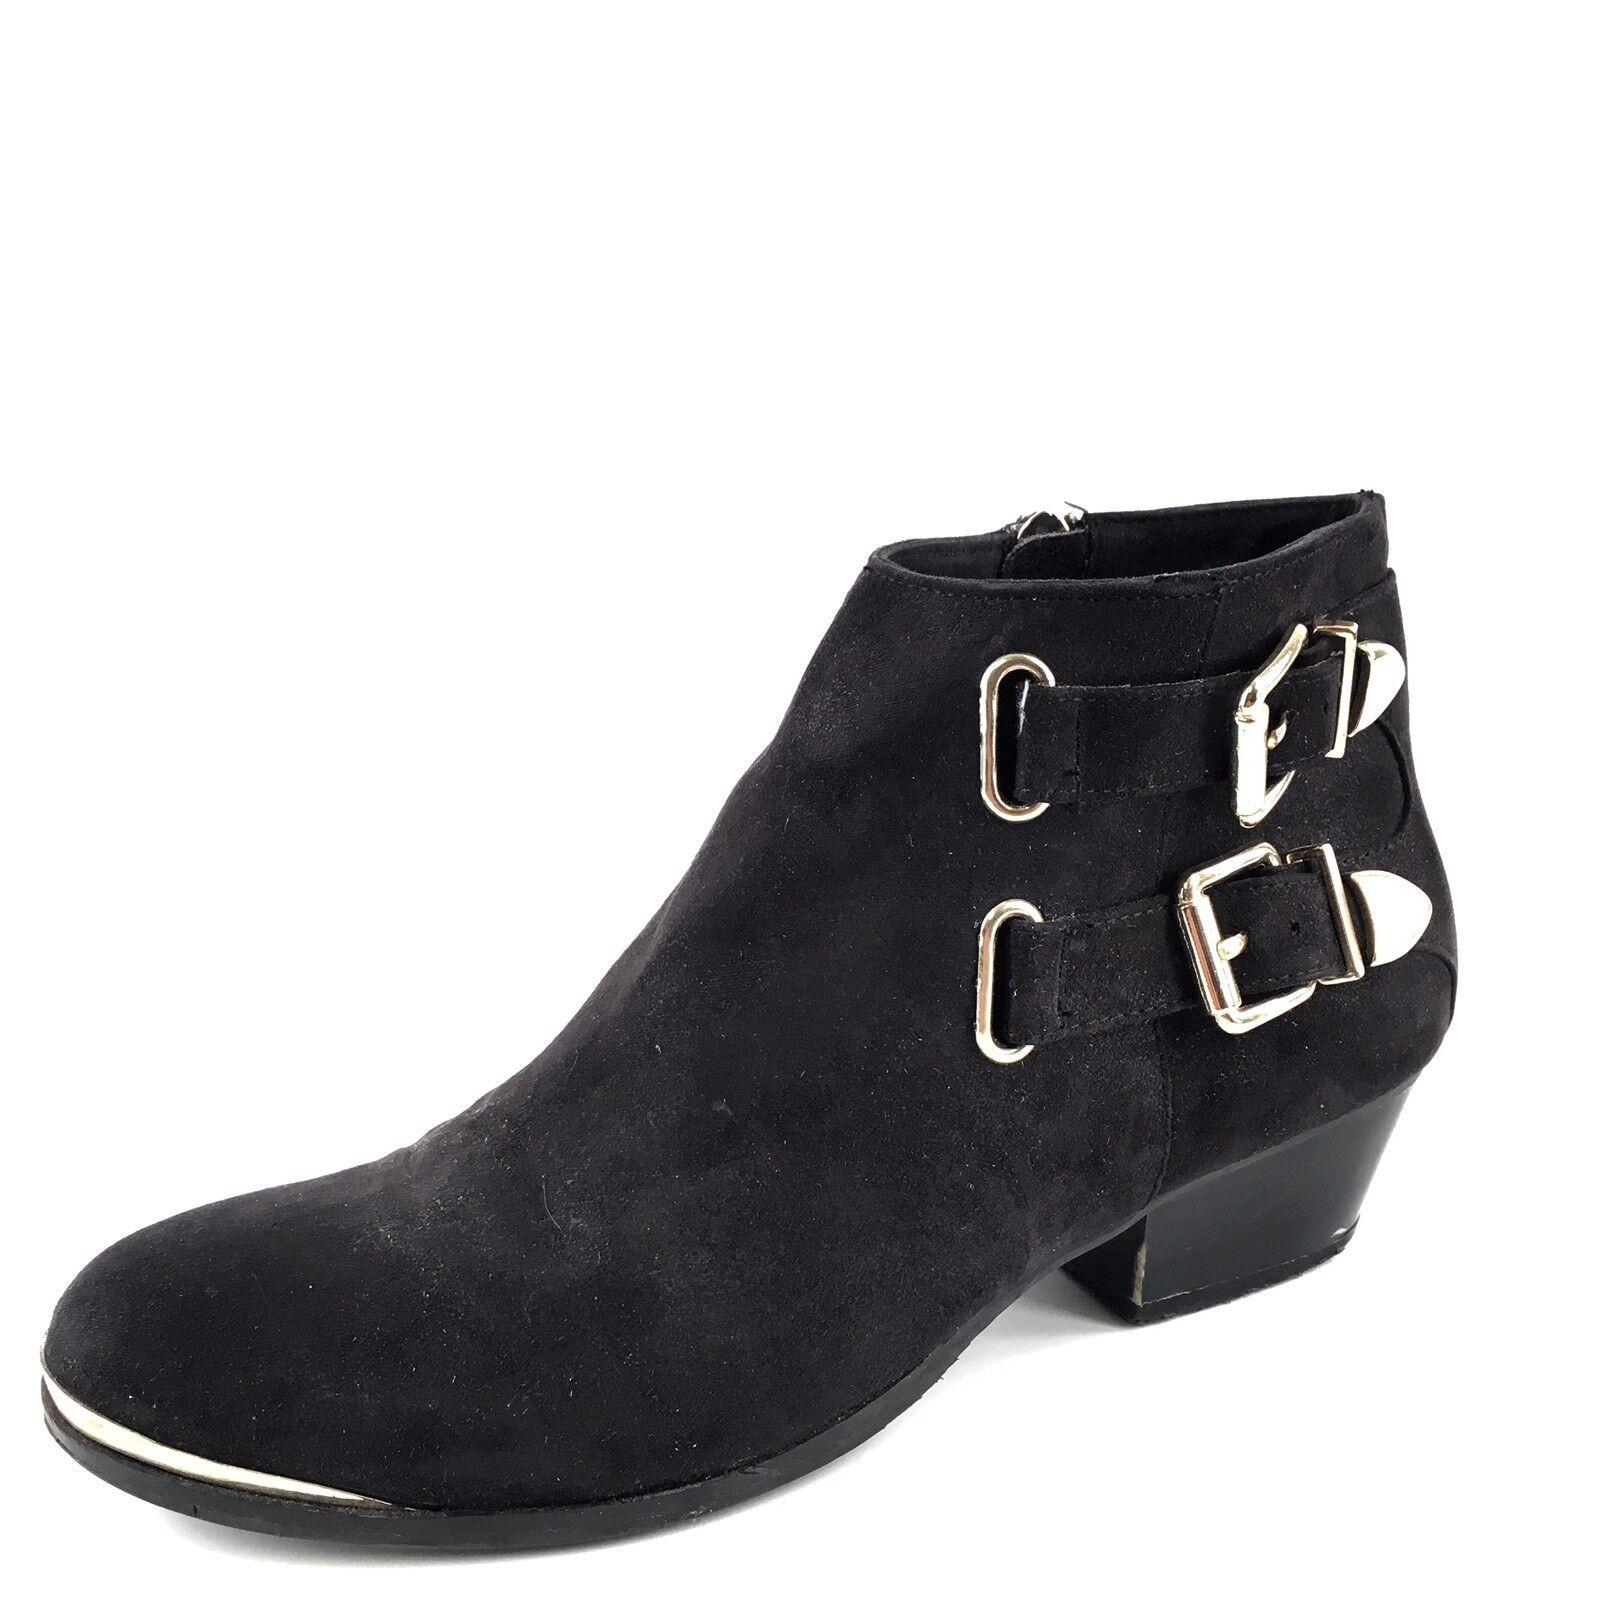 Tildon Black Suede Fashion Ankle Booties Women's Size 7 M*